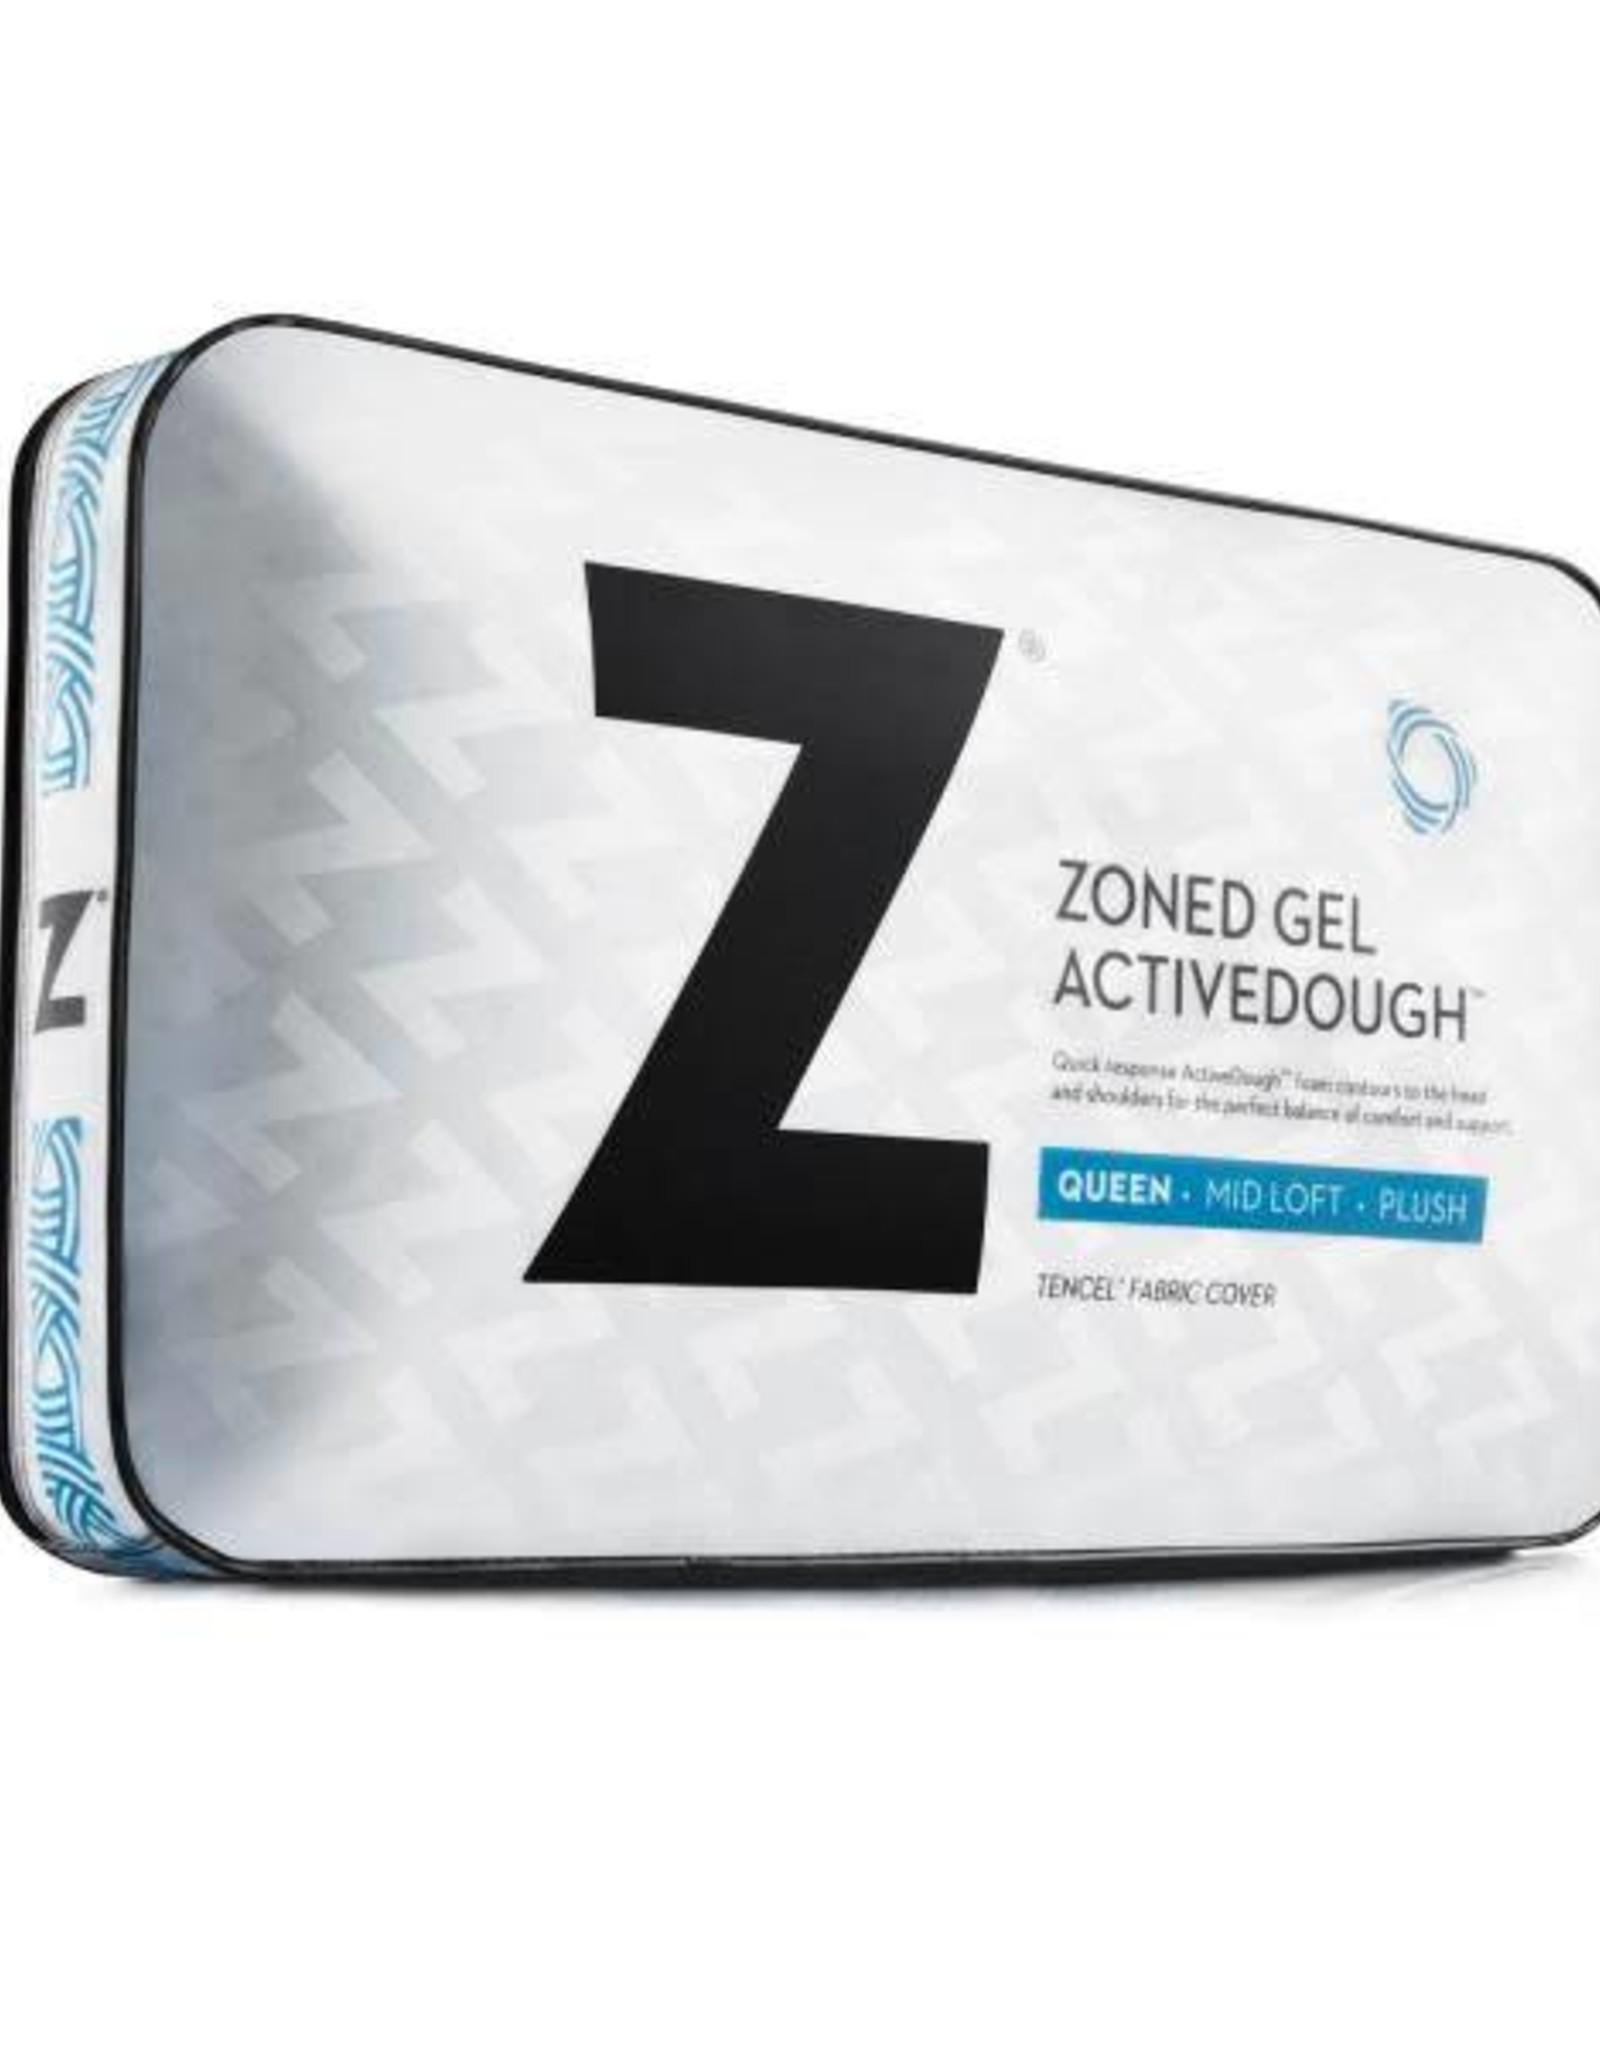 malouf z zoned activedough gel pillow mid loft